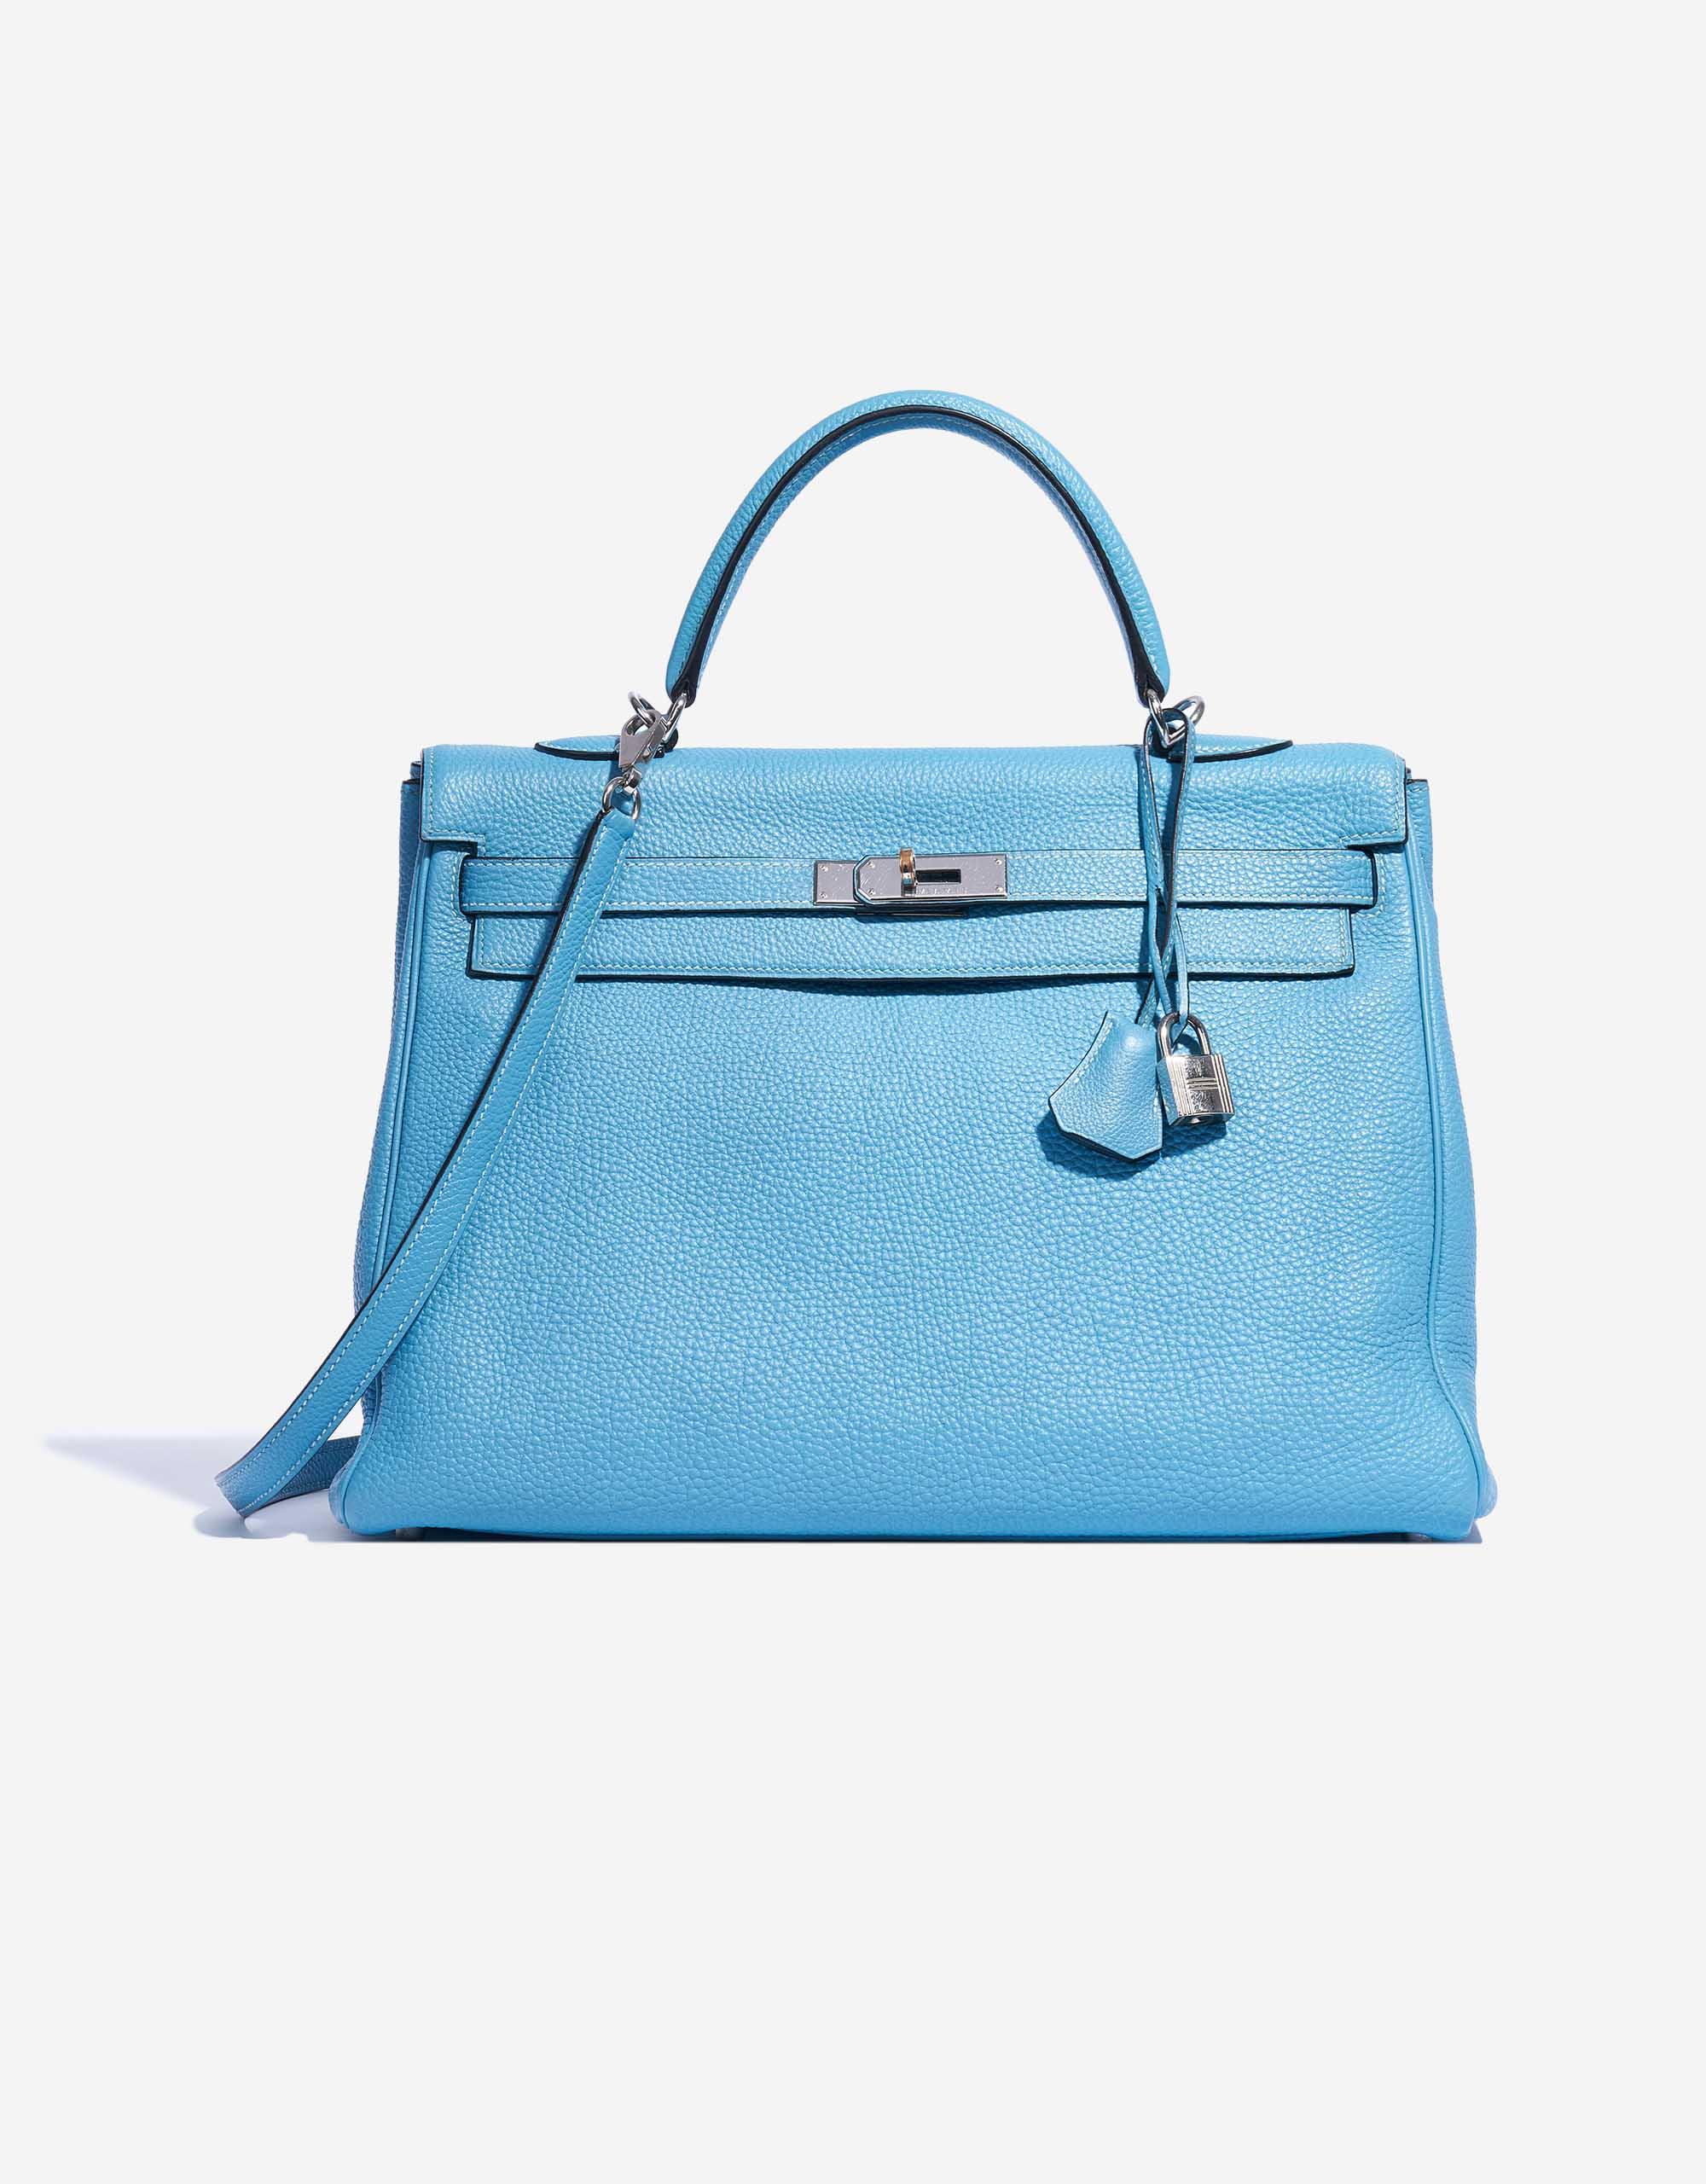 Hermès Kelly 35 Togo Blue Jean | SACLÀB